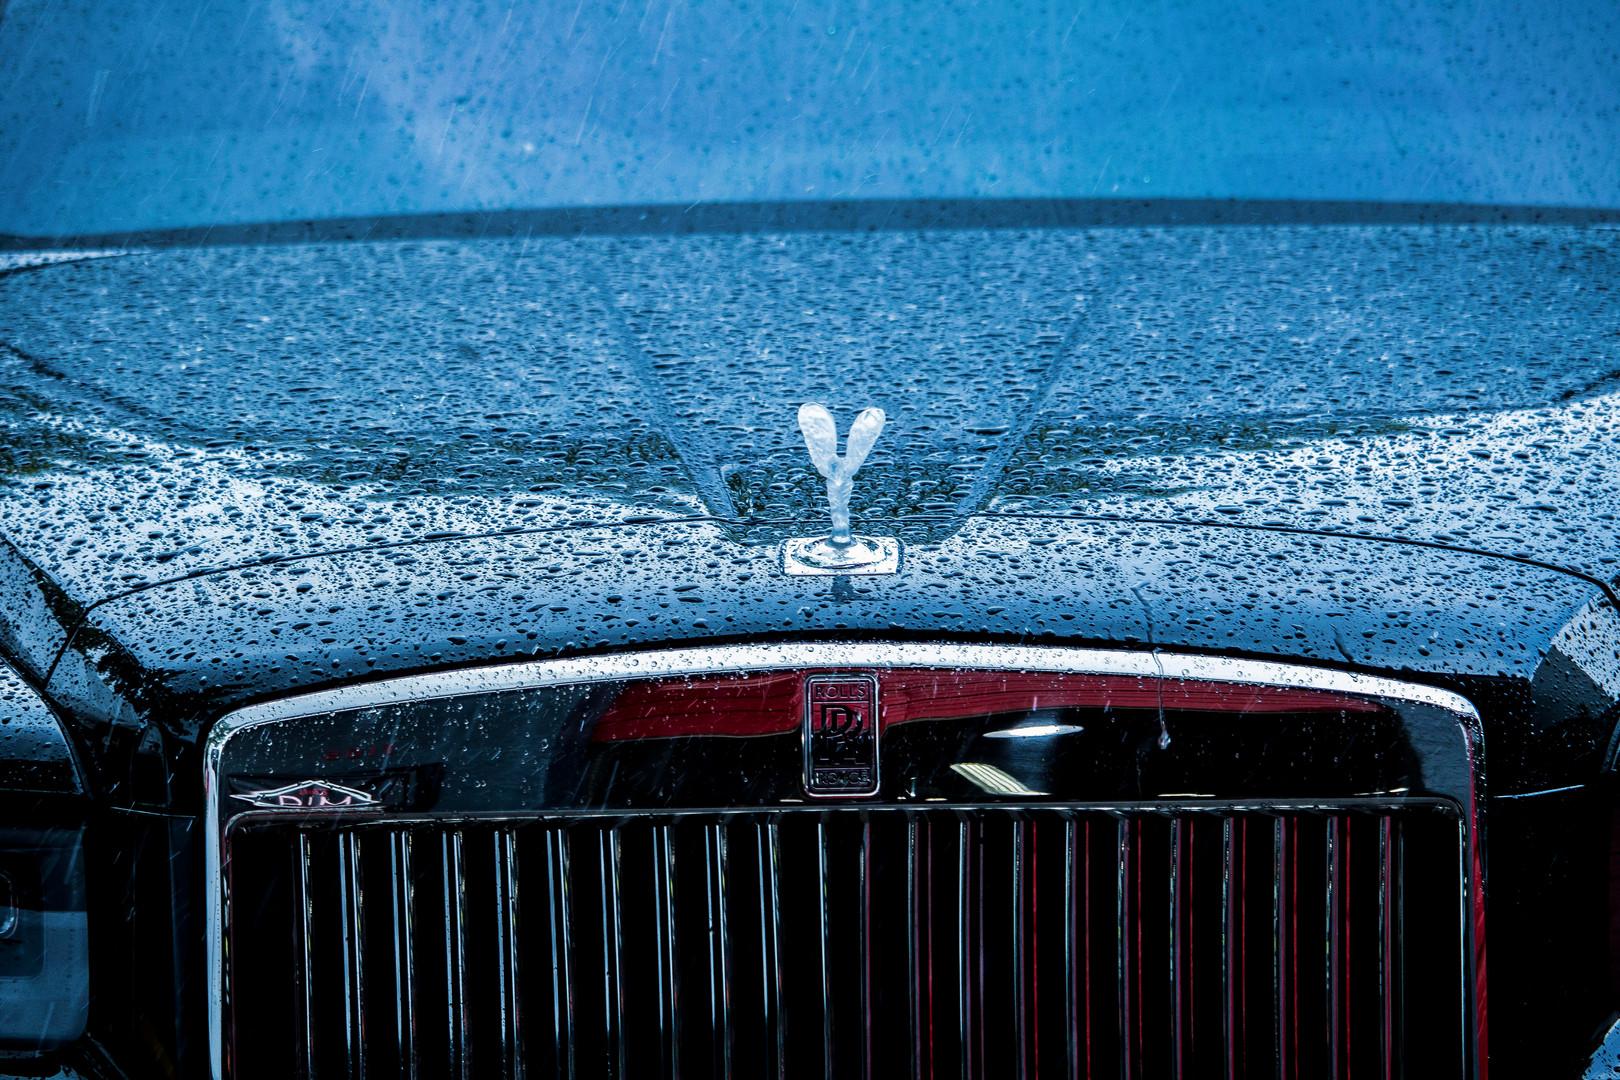 Black Rolls Royce Photographed by Jorge Alberto Perez Miami Photographer